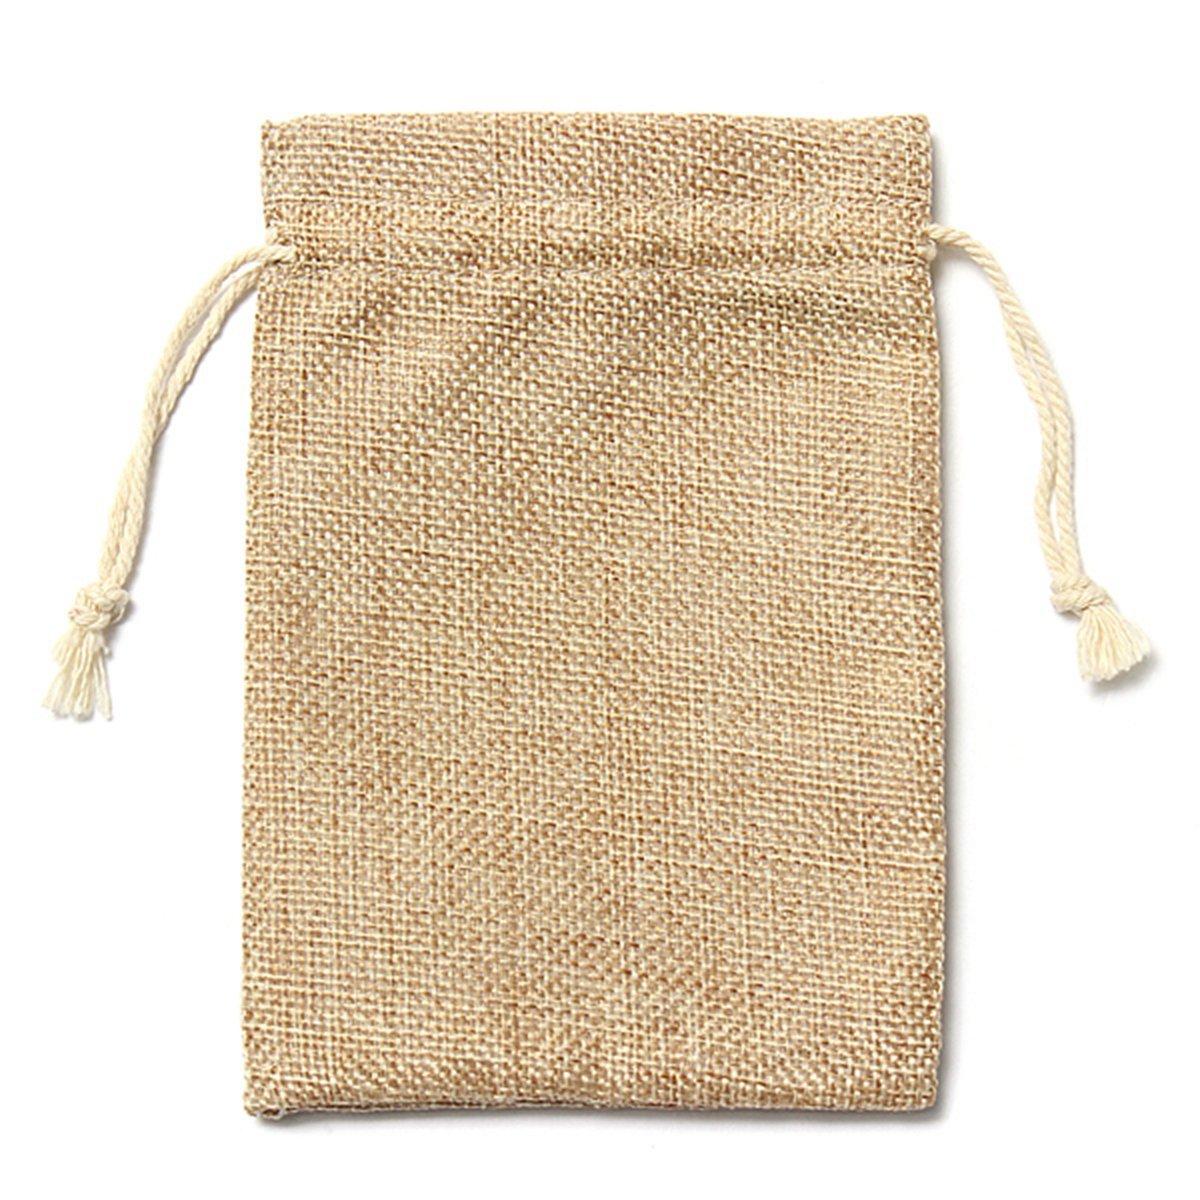 TOOGOO(R) 5pcs Vintage Burlap Jute Sacks Weddings Party Favor Drawstrings Gift Bags